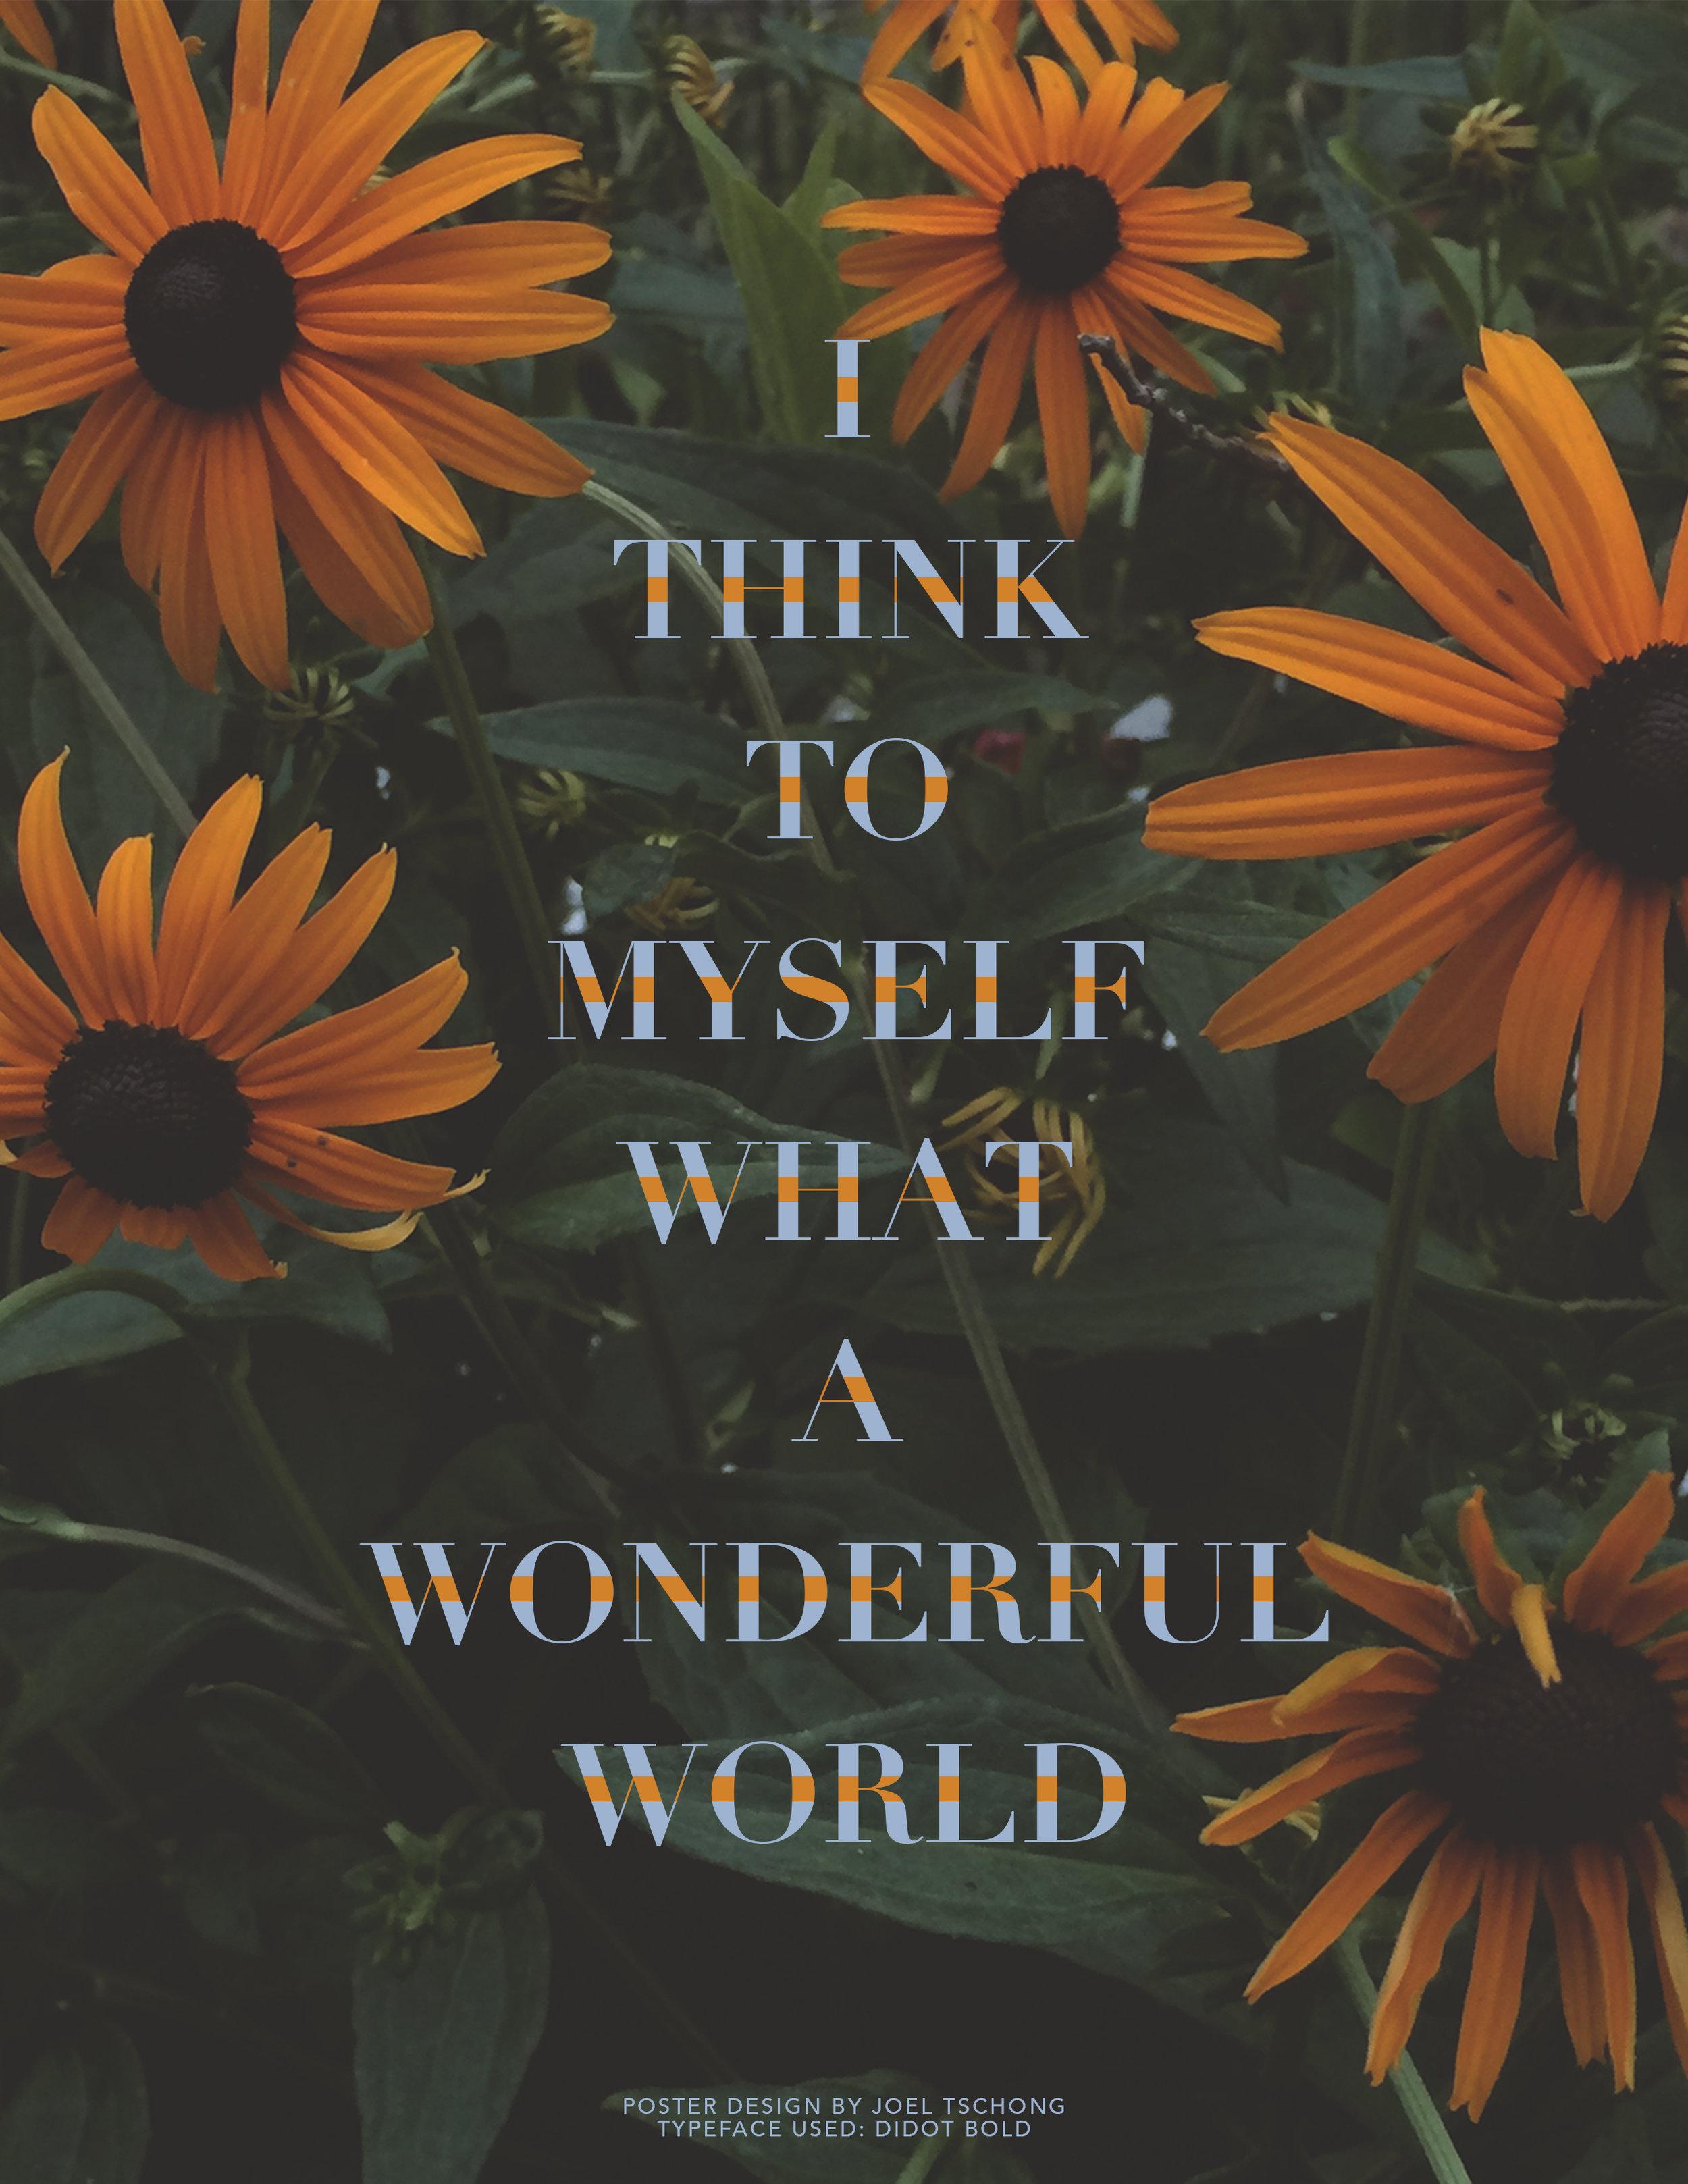 wonderfulworld_image.jpg